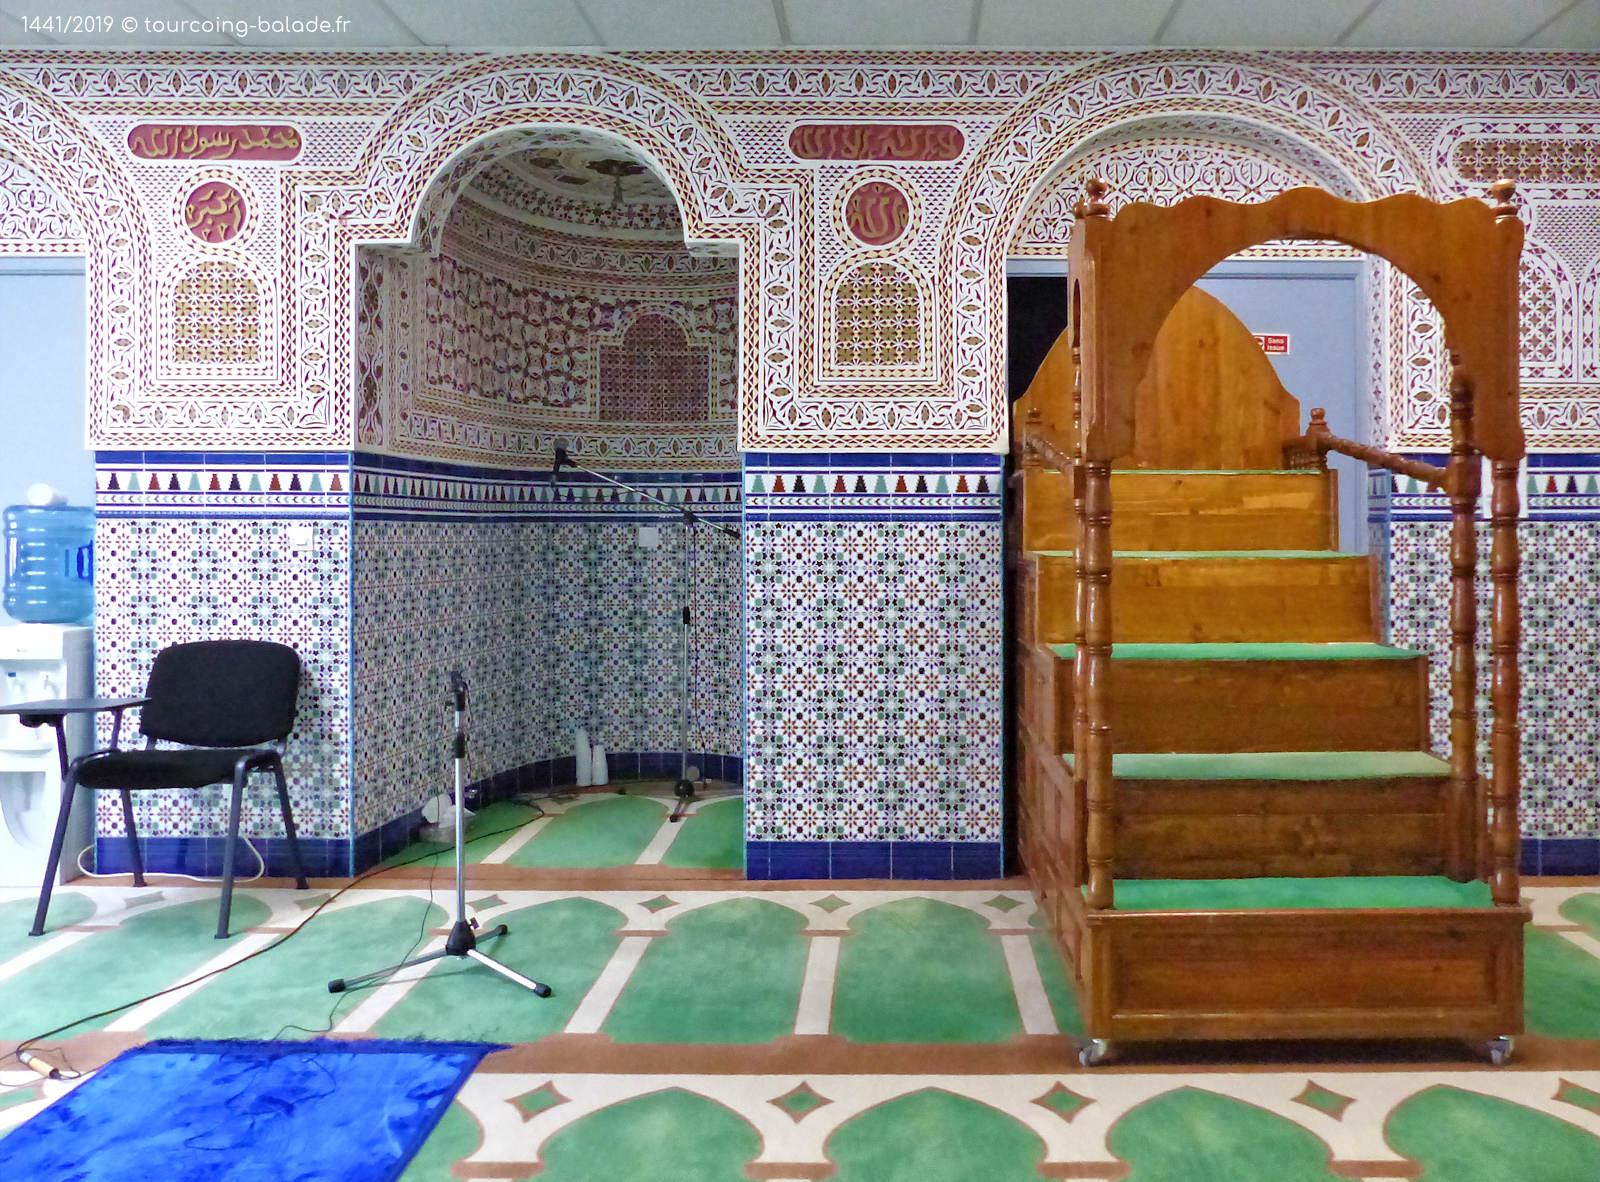 Mosquée es-Salam Tourcoing, France - Mihrab et Minbar